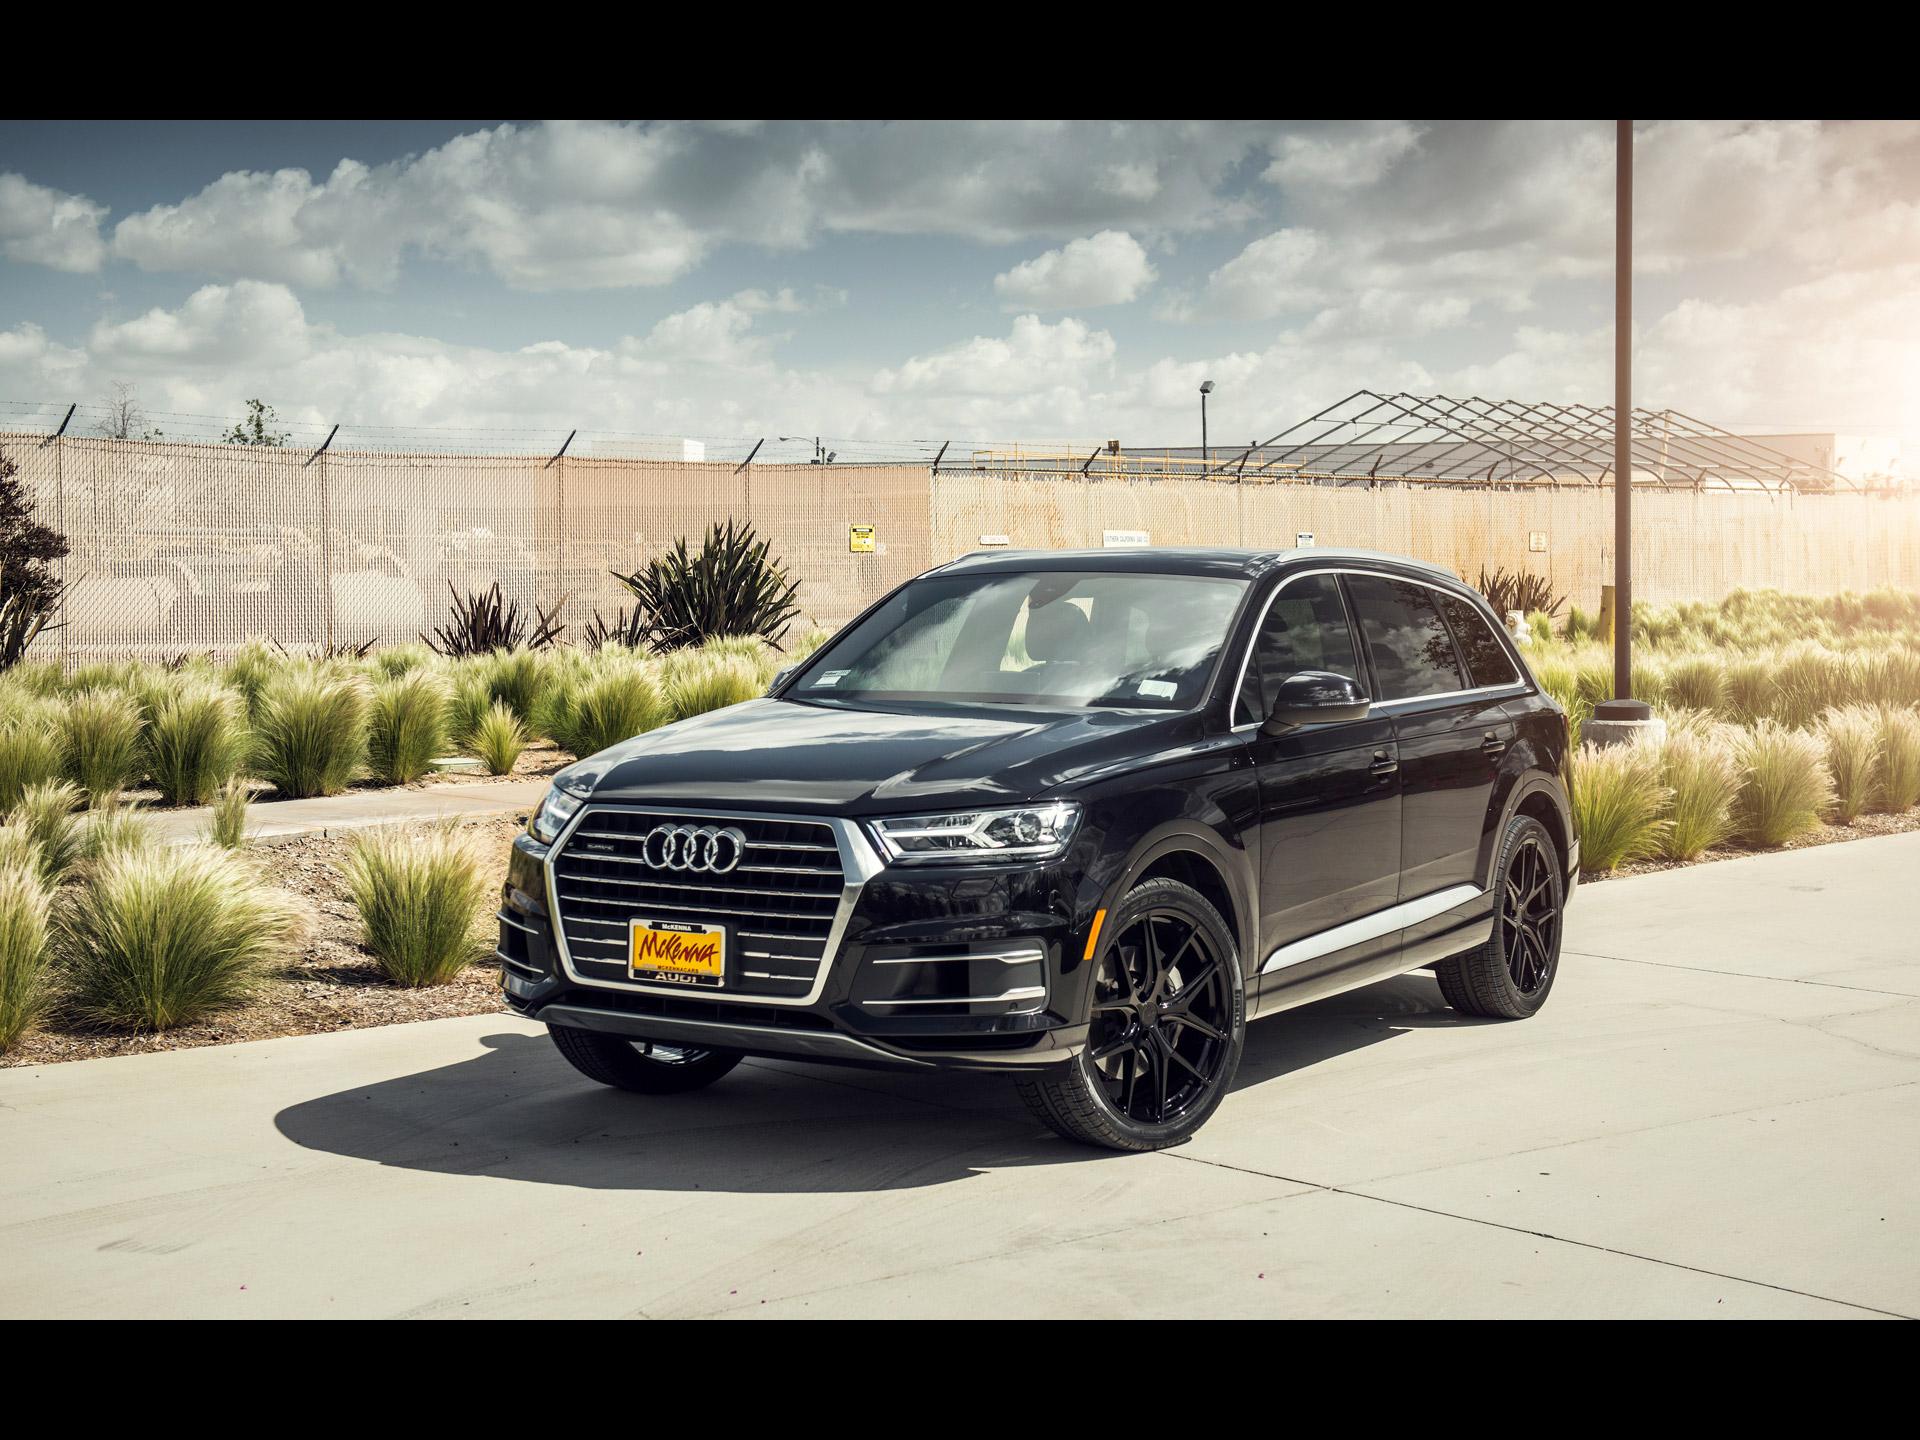 2018 Audi A4 Oil Leak | 2017 2018 2019 Audi Reviews